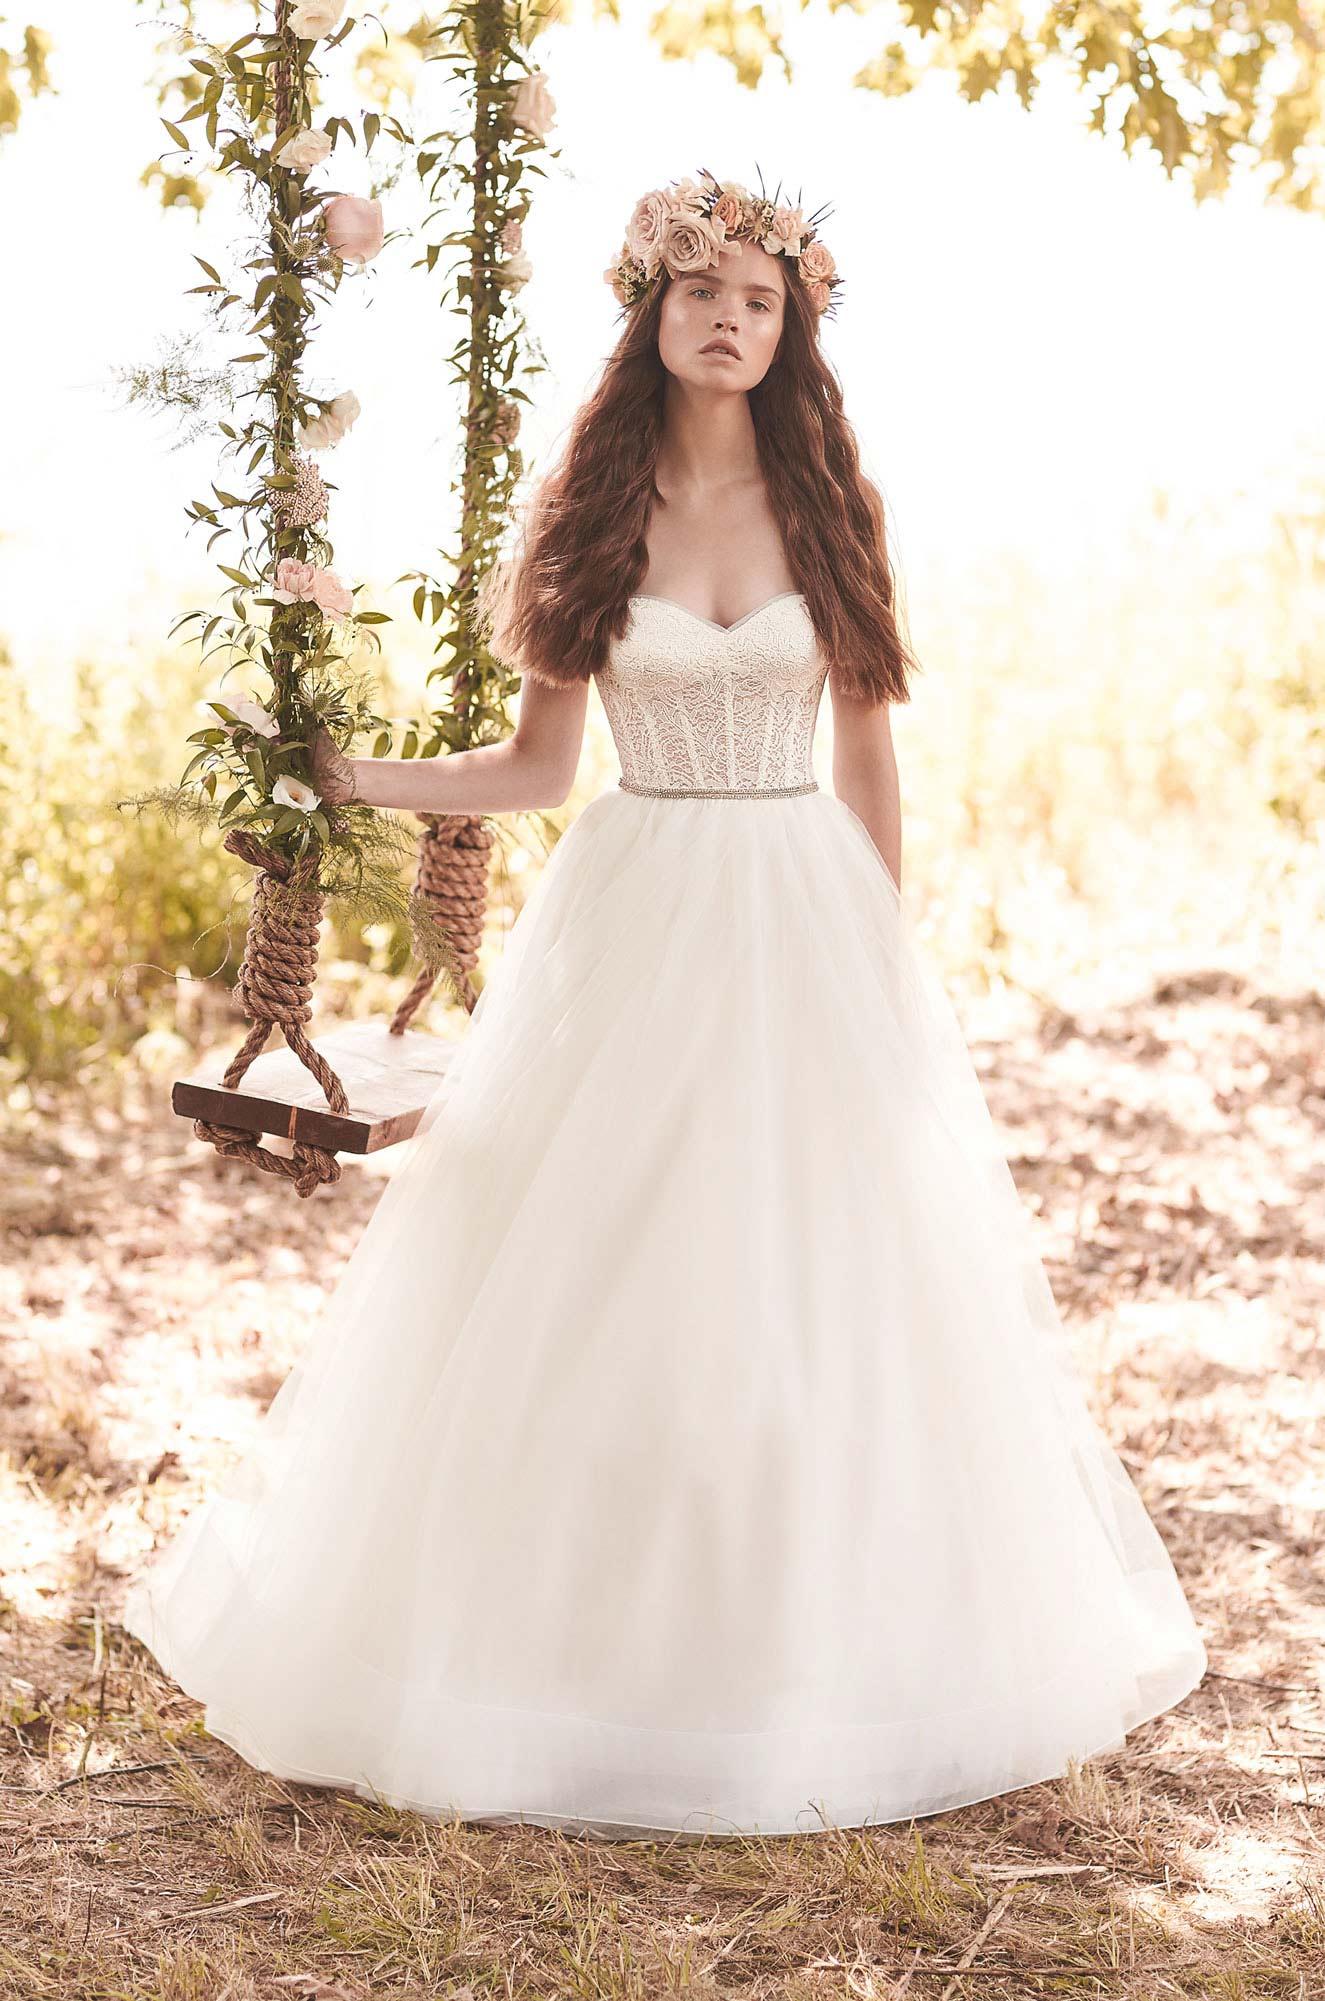 Style  2065 Corset Bodice Wedding Dress   Style  Corset Bodice Wedding Dress   Style  2065   Mikaella Bridal. Corset Bodice Wedding Dress. Home Design Ideas